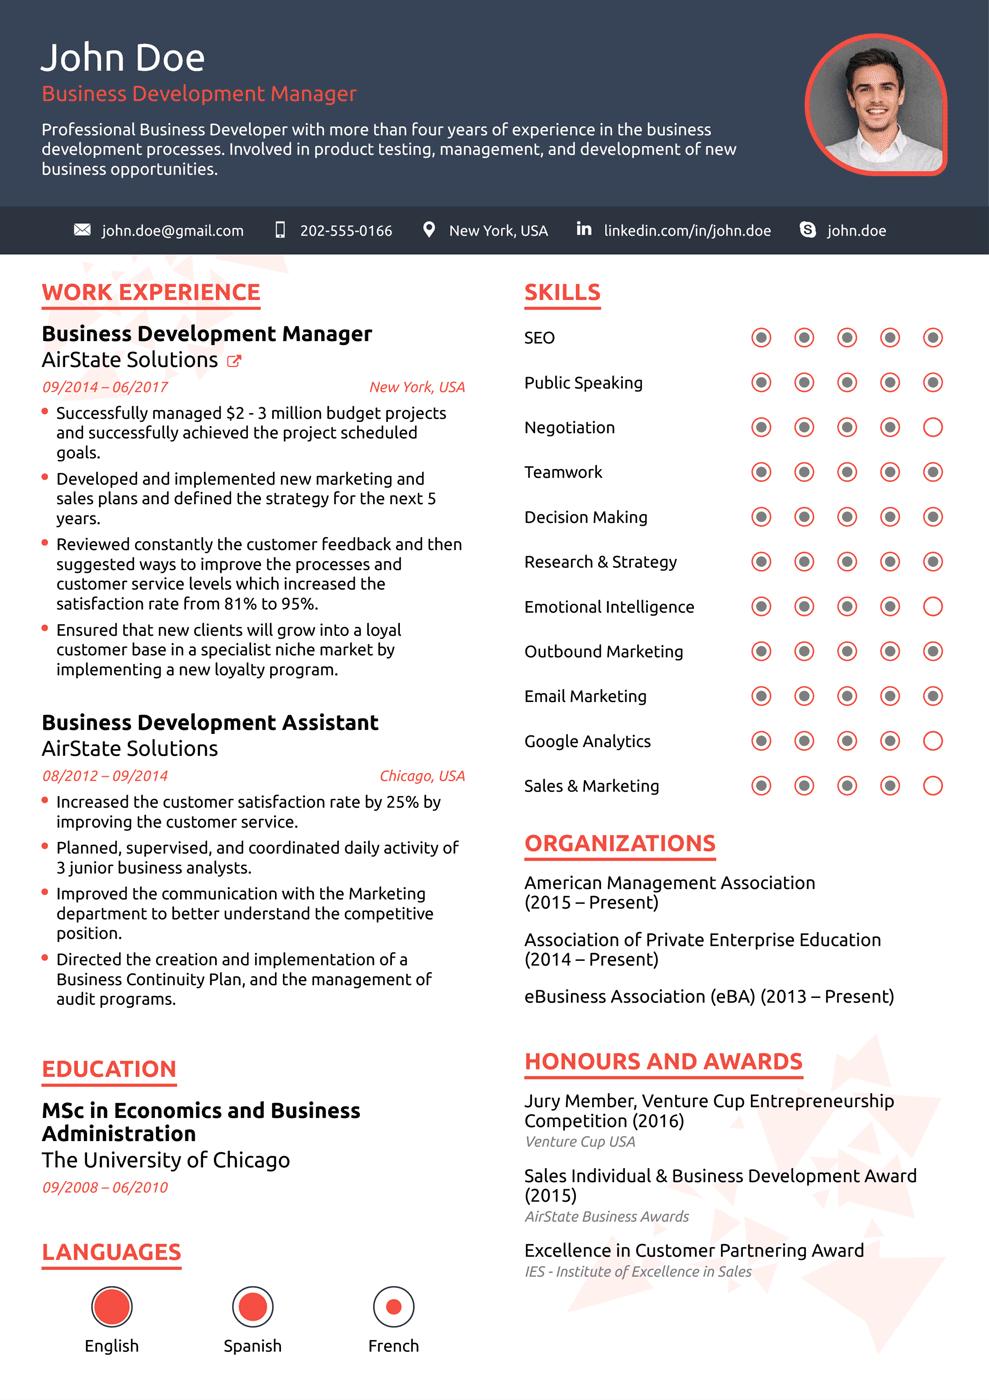 Creative Resume Template Free Creative Resume Template creative resume template free|wikiresume.com